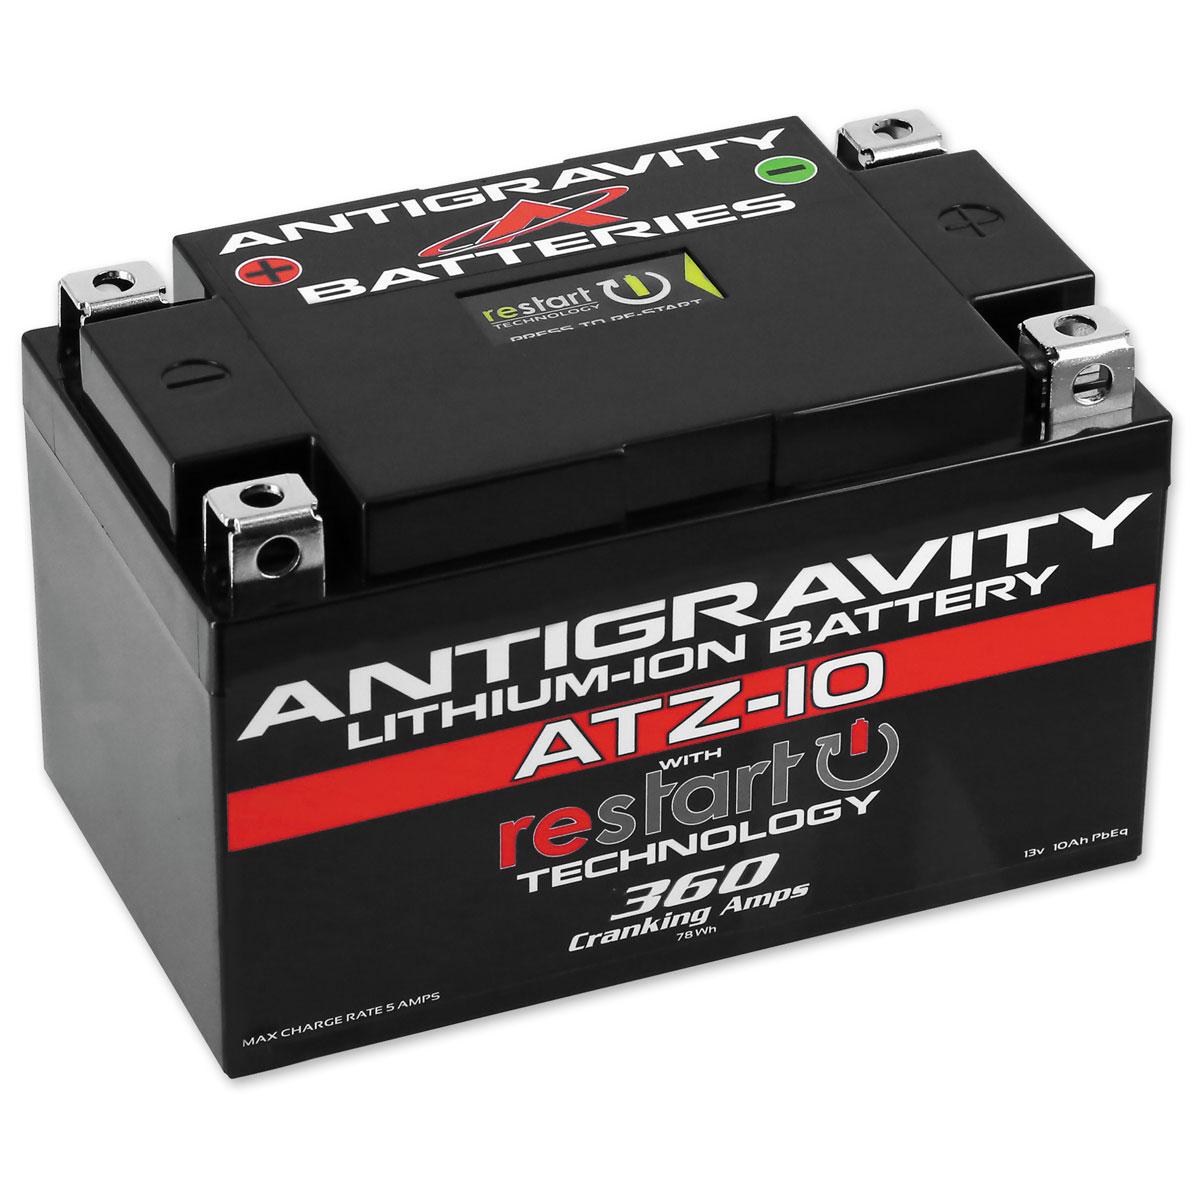 Antigravity RE-START Lithium Ion Battery